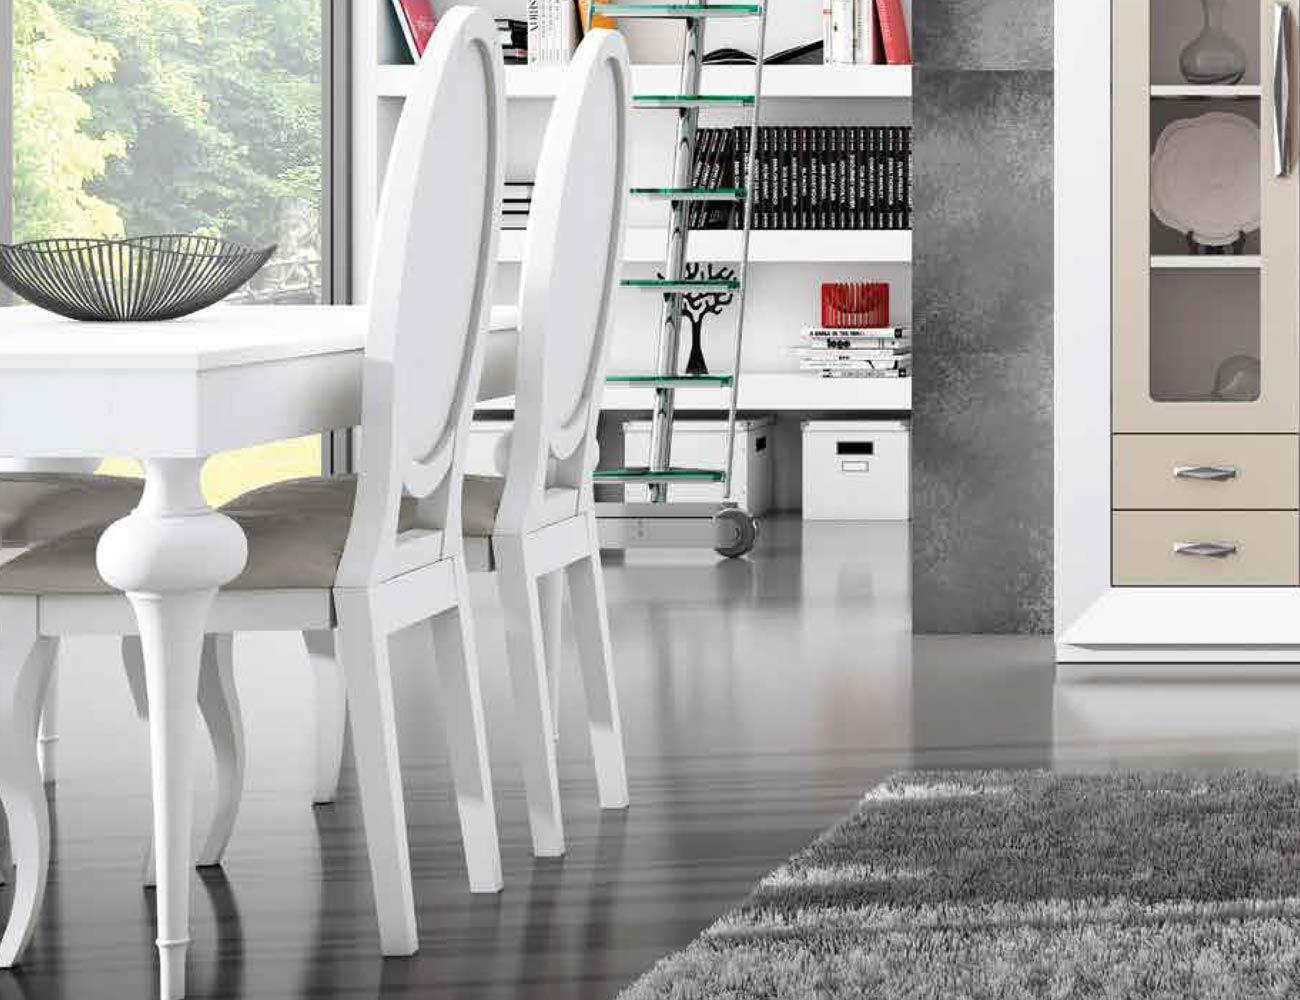 Mesa sillas composicion 01